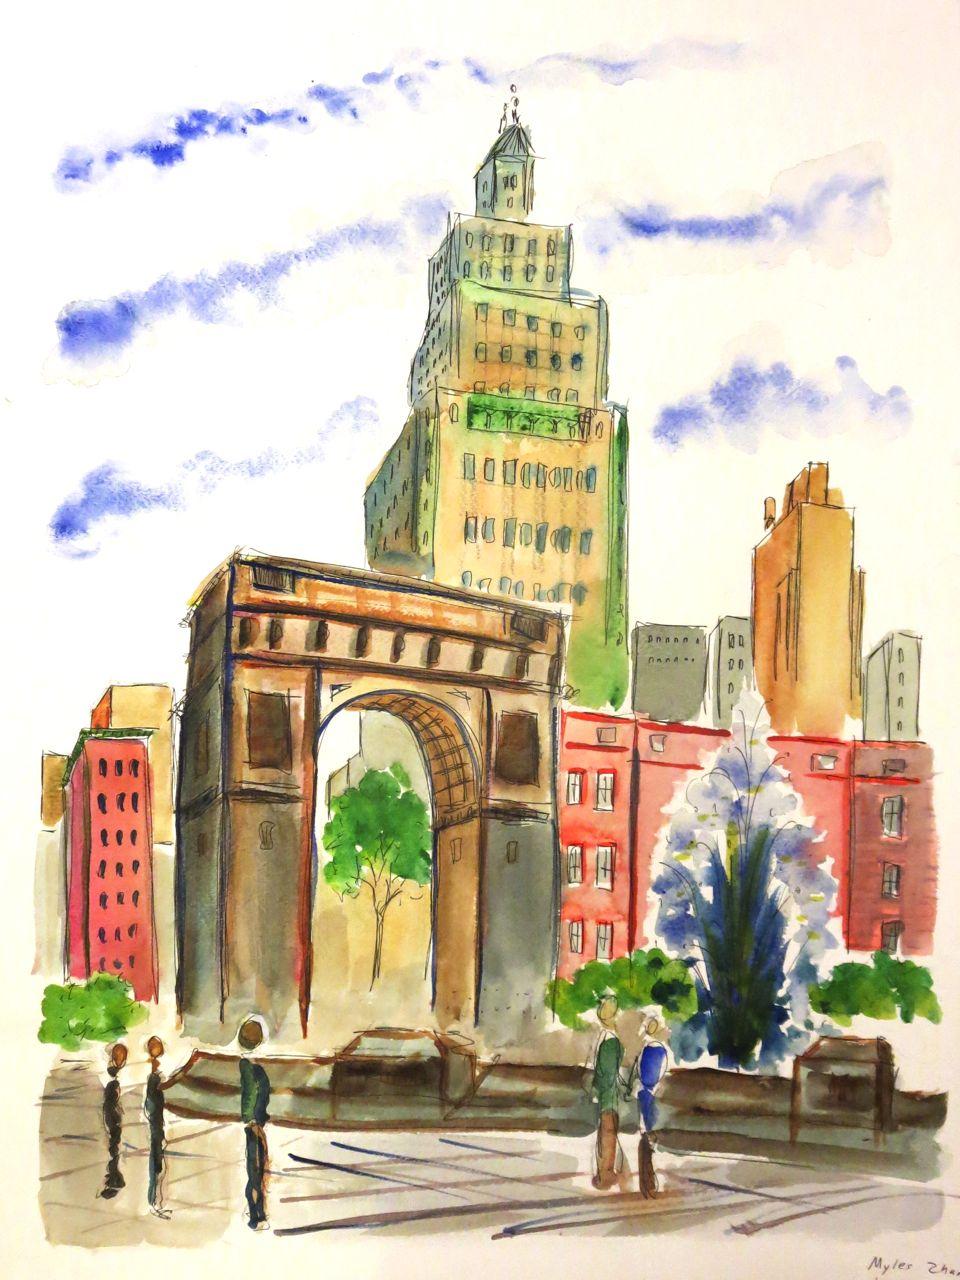 Washington-Square-Park-246r5vi.jpg